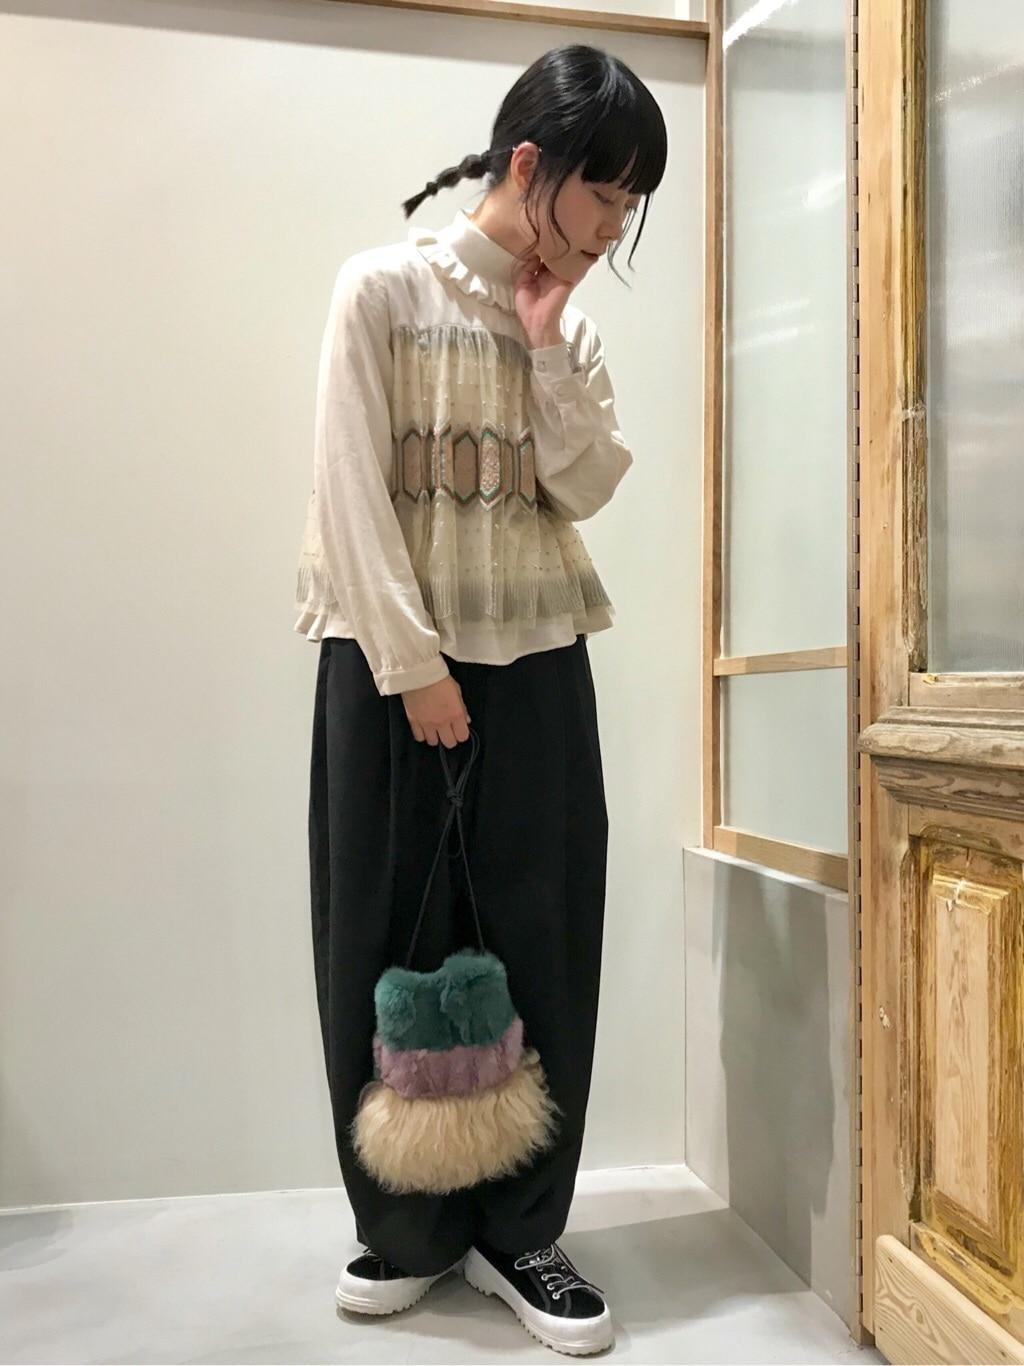 bulle de savon 渋谷スクランブルスクエア 身長:153cm 2019.12.24